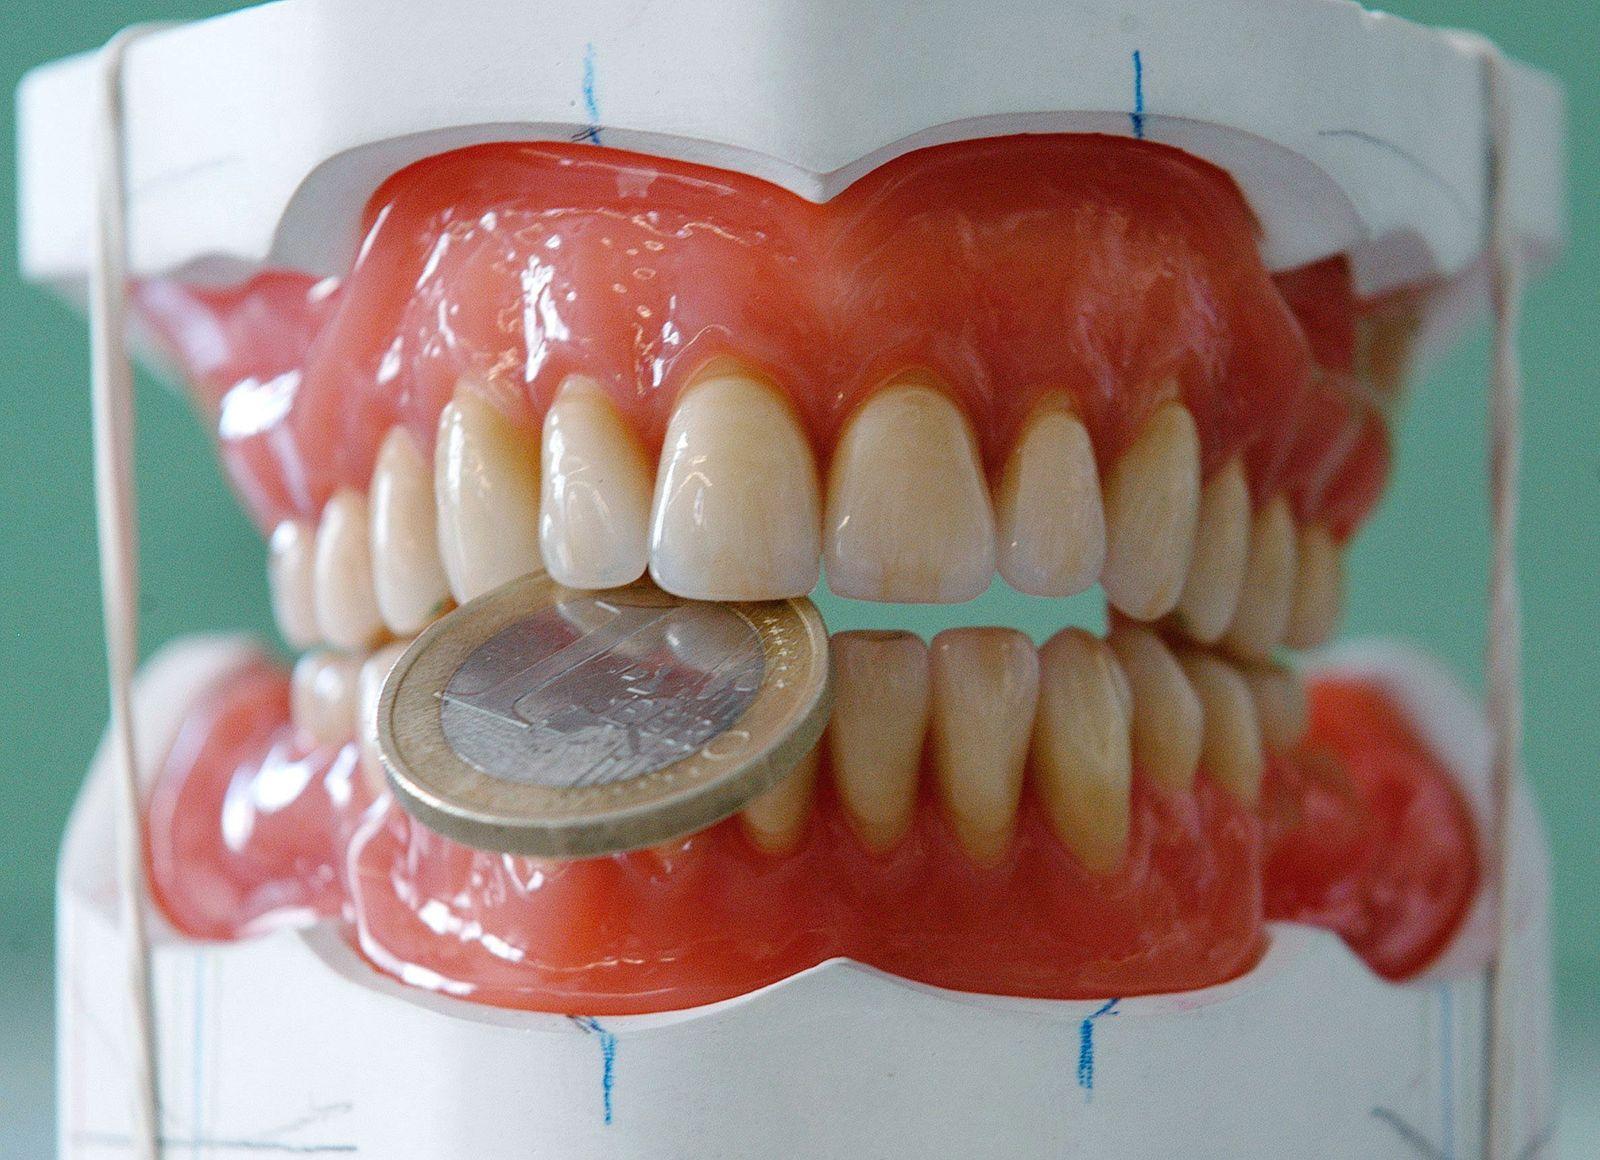 Symbolfoto Zahnersatz